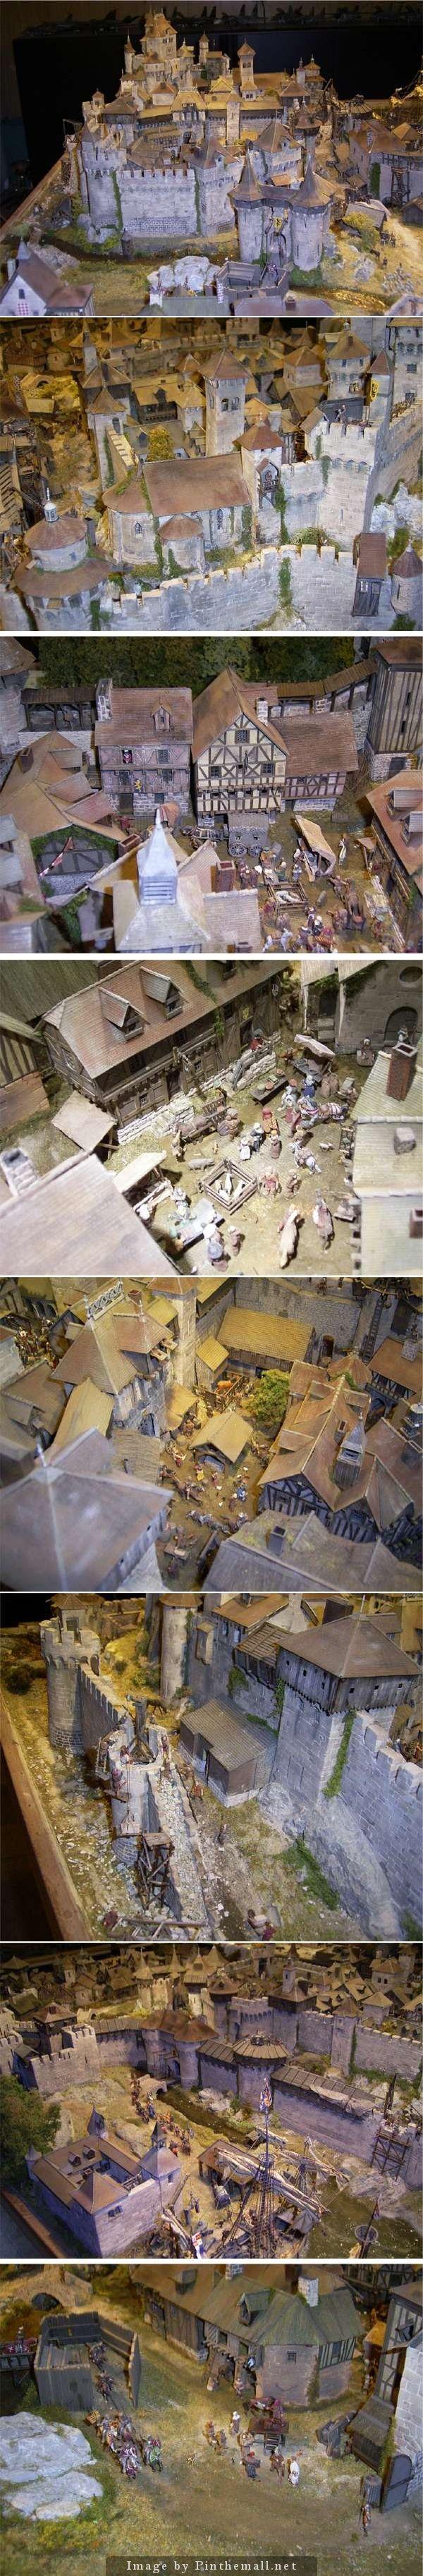 http://addict-figurines.forumgratuit.fr/t79-ville-fortifiee - created via http://pinthemall.net